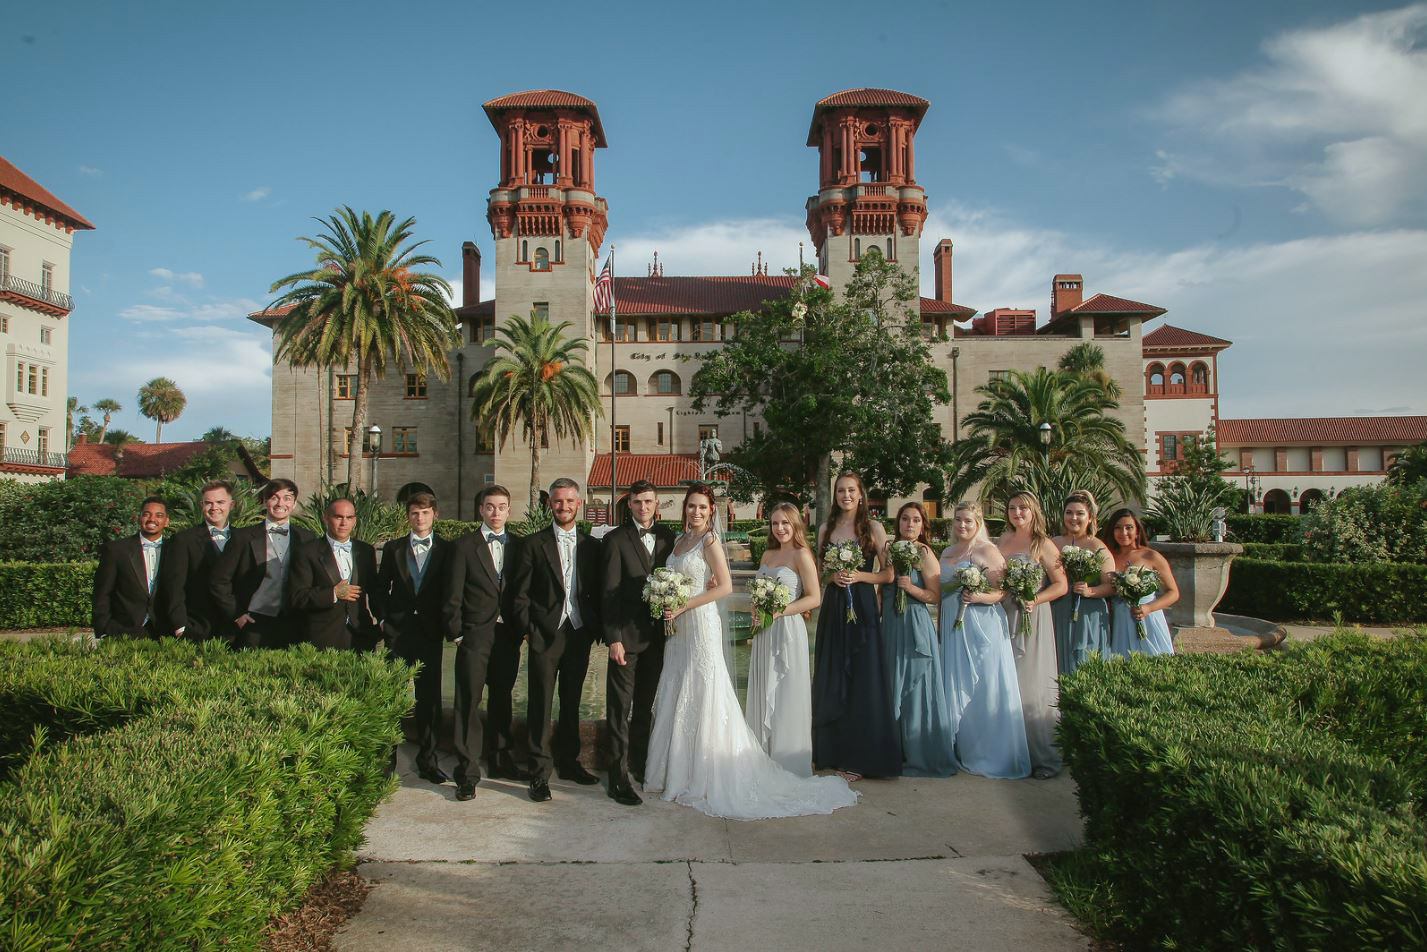 15-Treasury-onthe-plaza-SaintAugustine-wedding-photographer-jarstudio.JPG